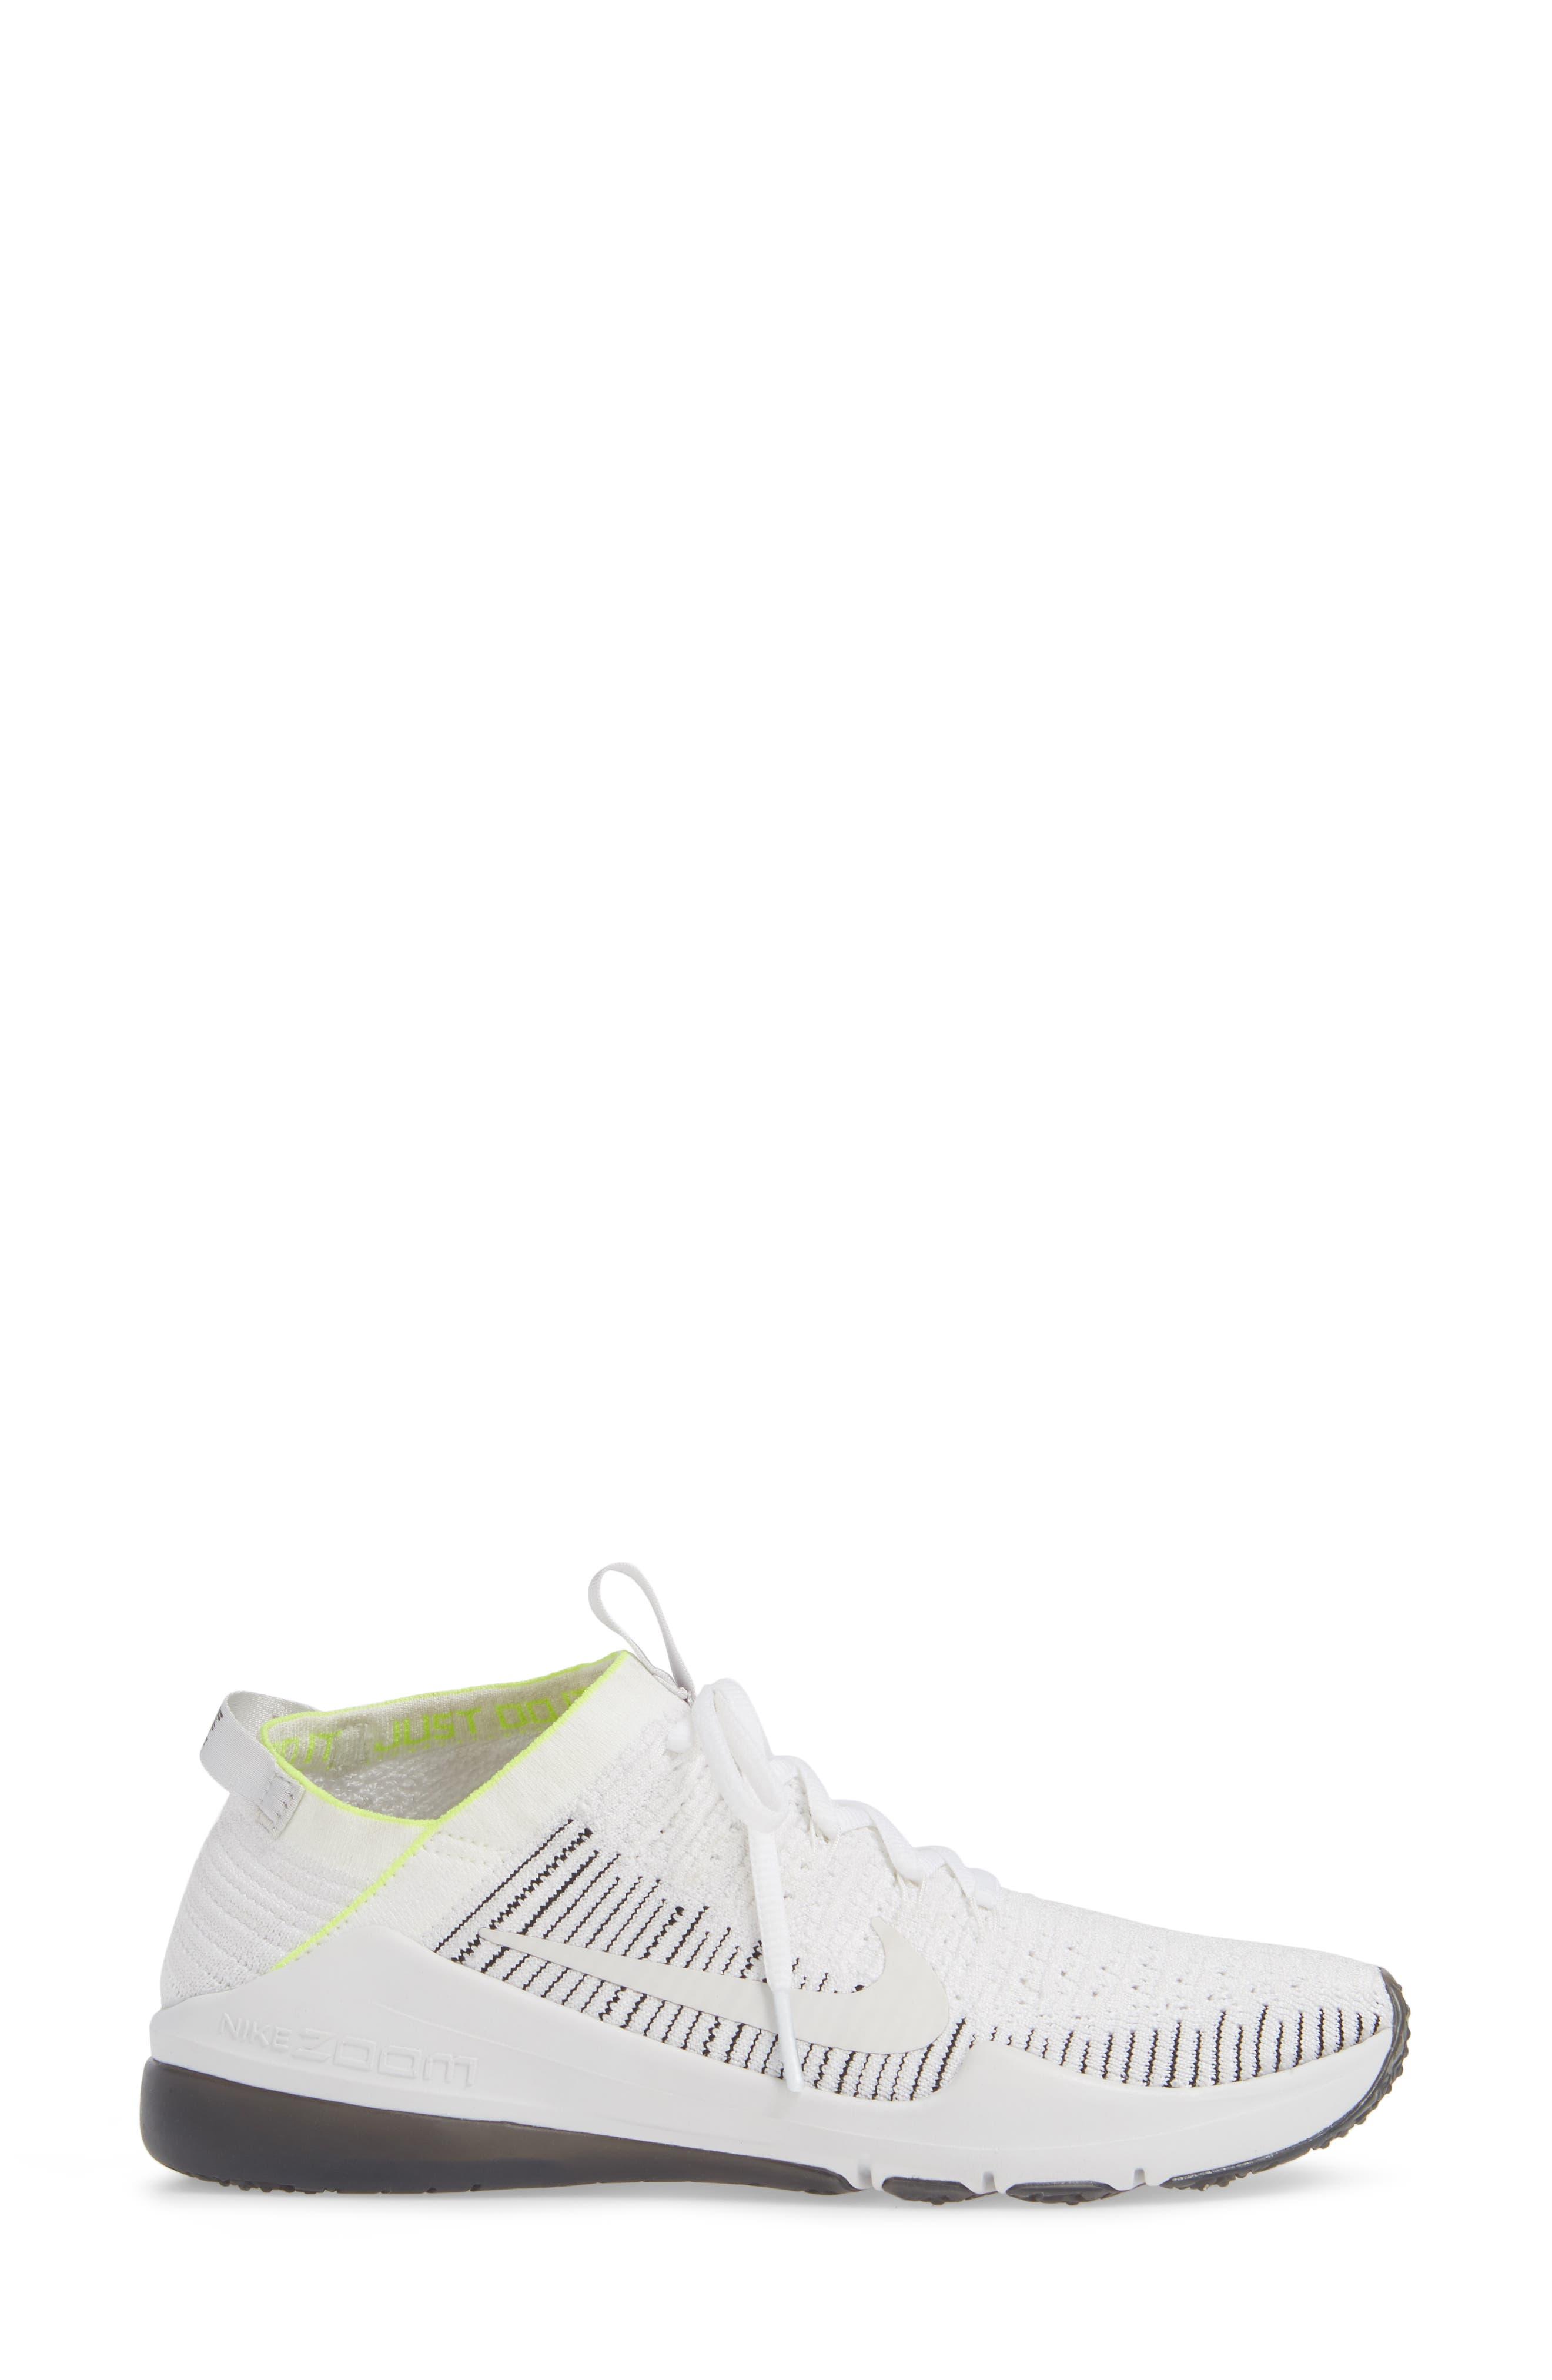 Air Zoom Fearless Flyknit 2 Training Sneaker,                             Alternate thumbnail 3, color,                             WHITE/ PLATINUM TINT/ BLACK